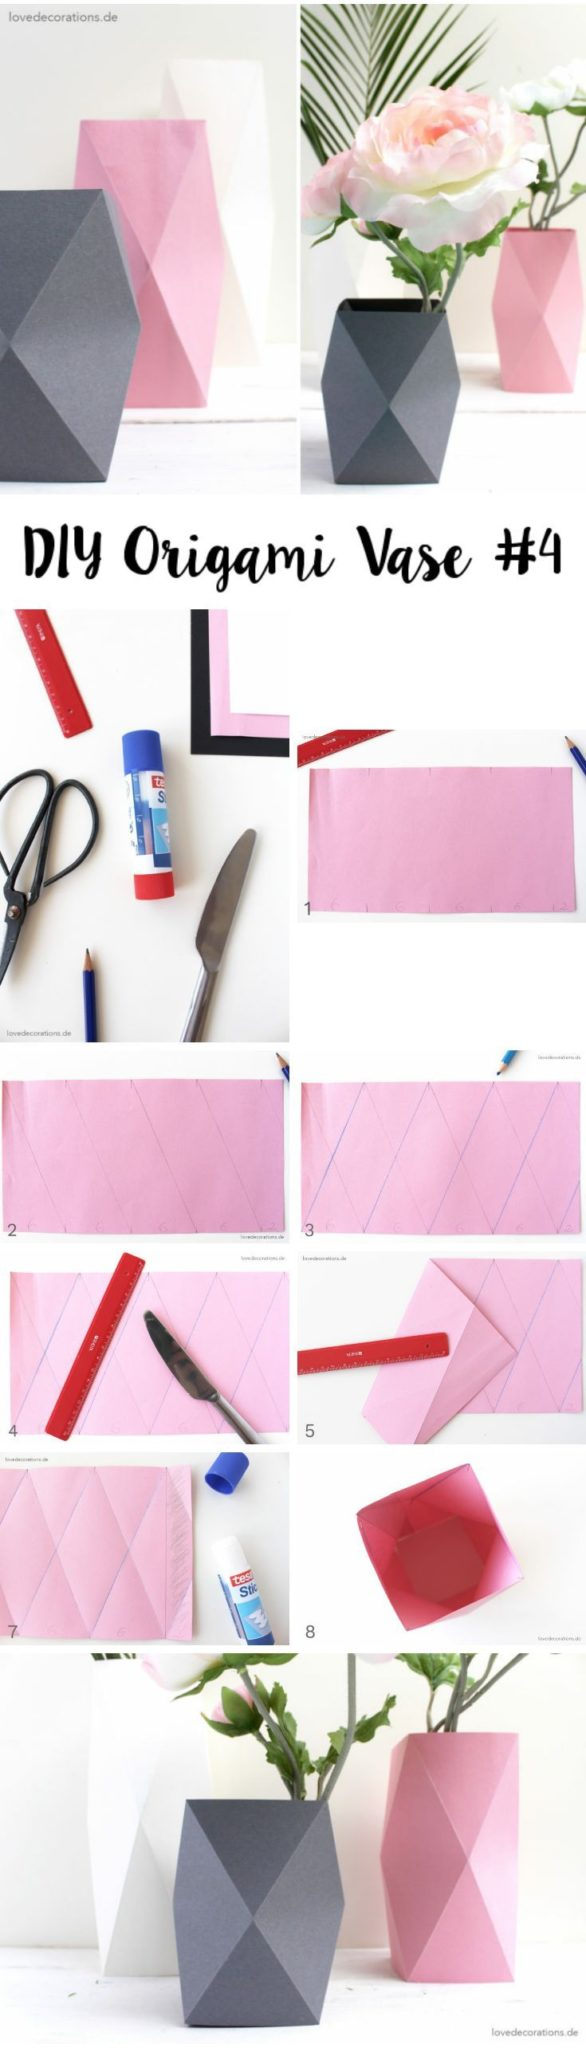 manualidades kawaii de origami